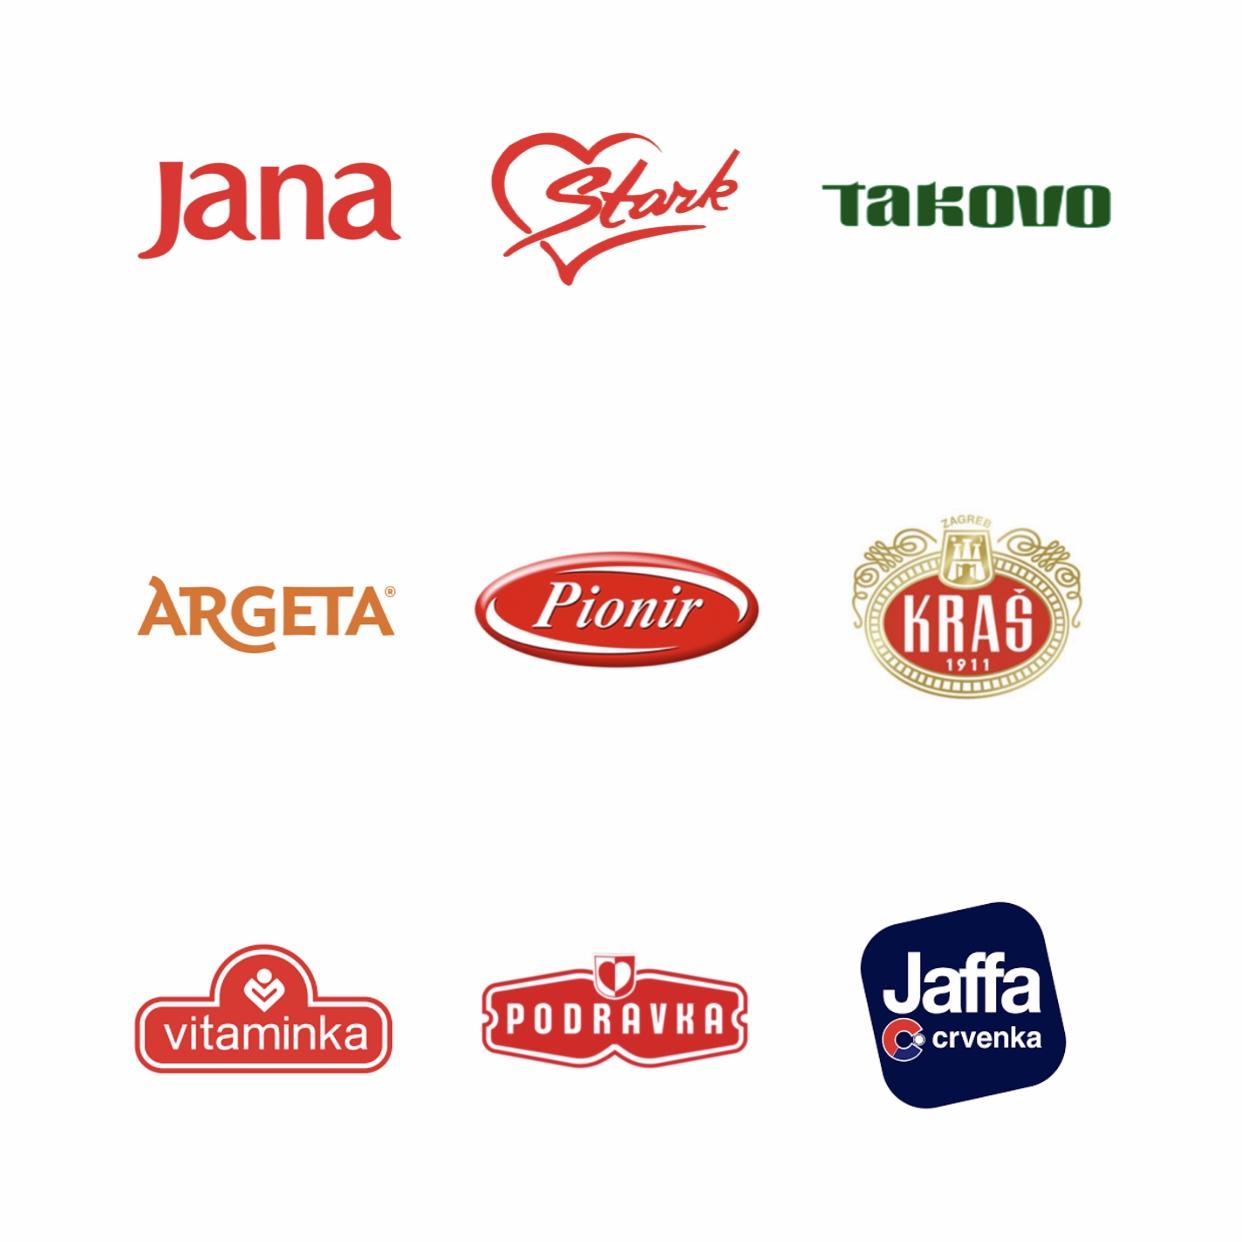 Top-Marken aus dem Balkan